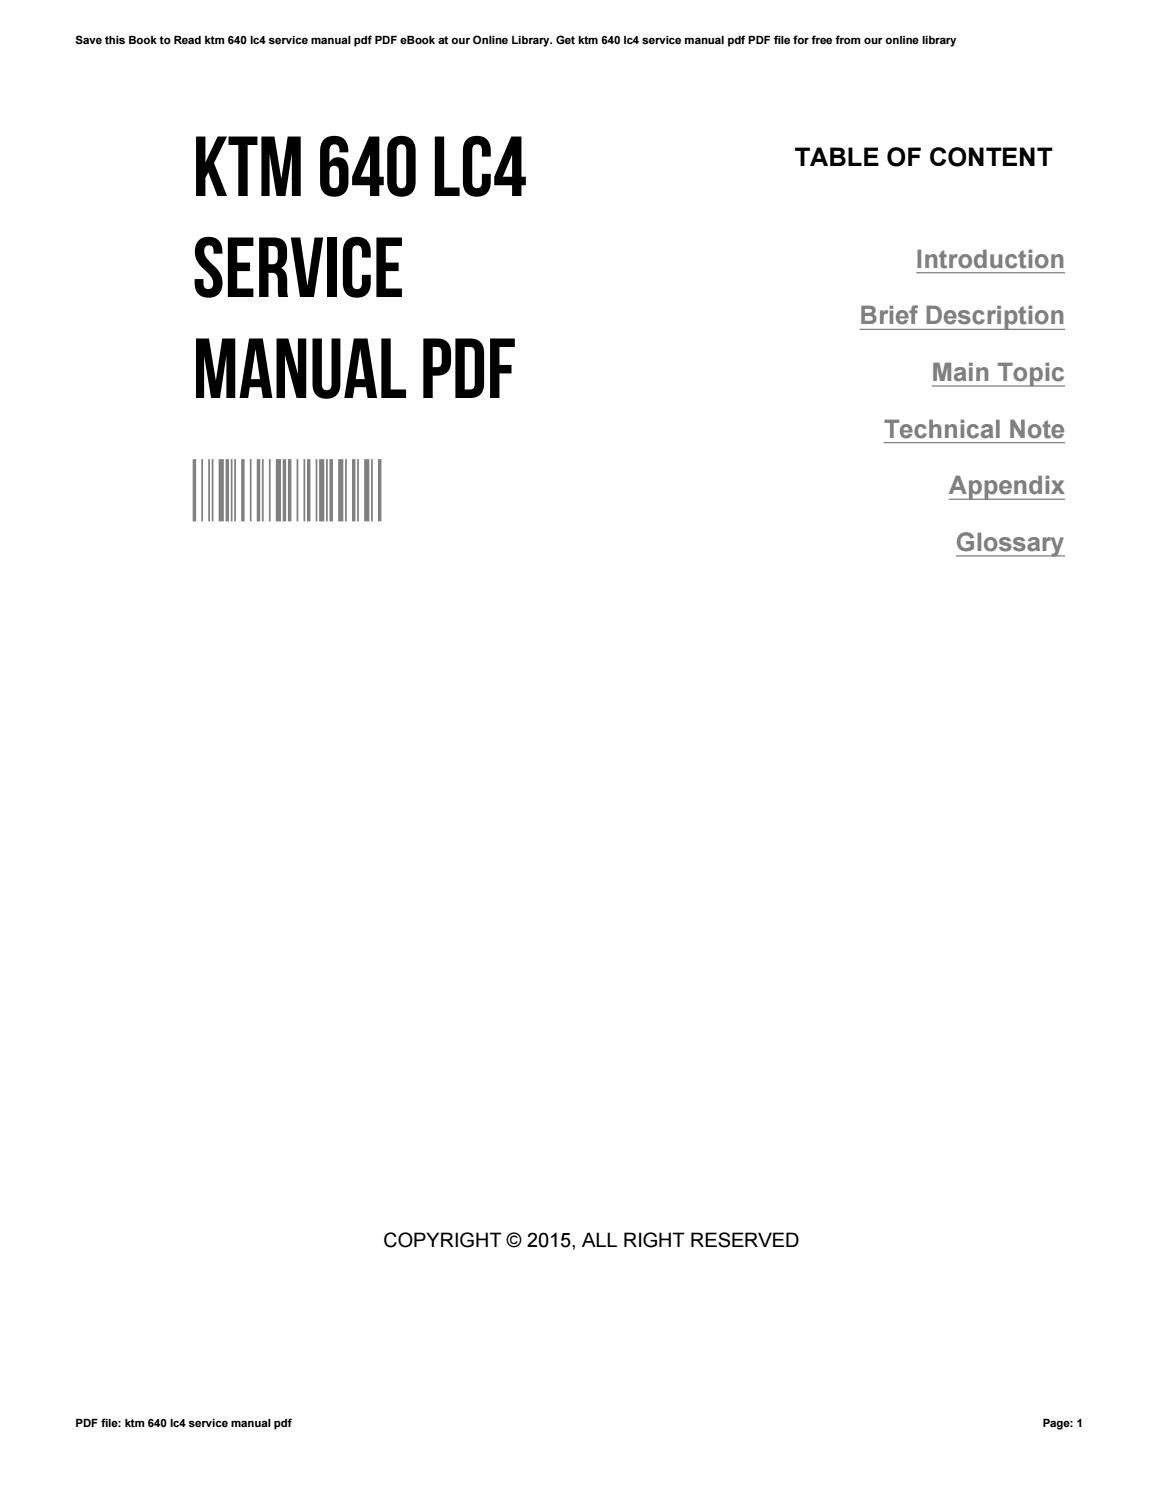 ktm 640 lc4 service manual pdf by dennisbryant3678